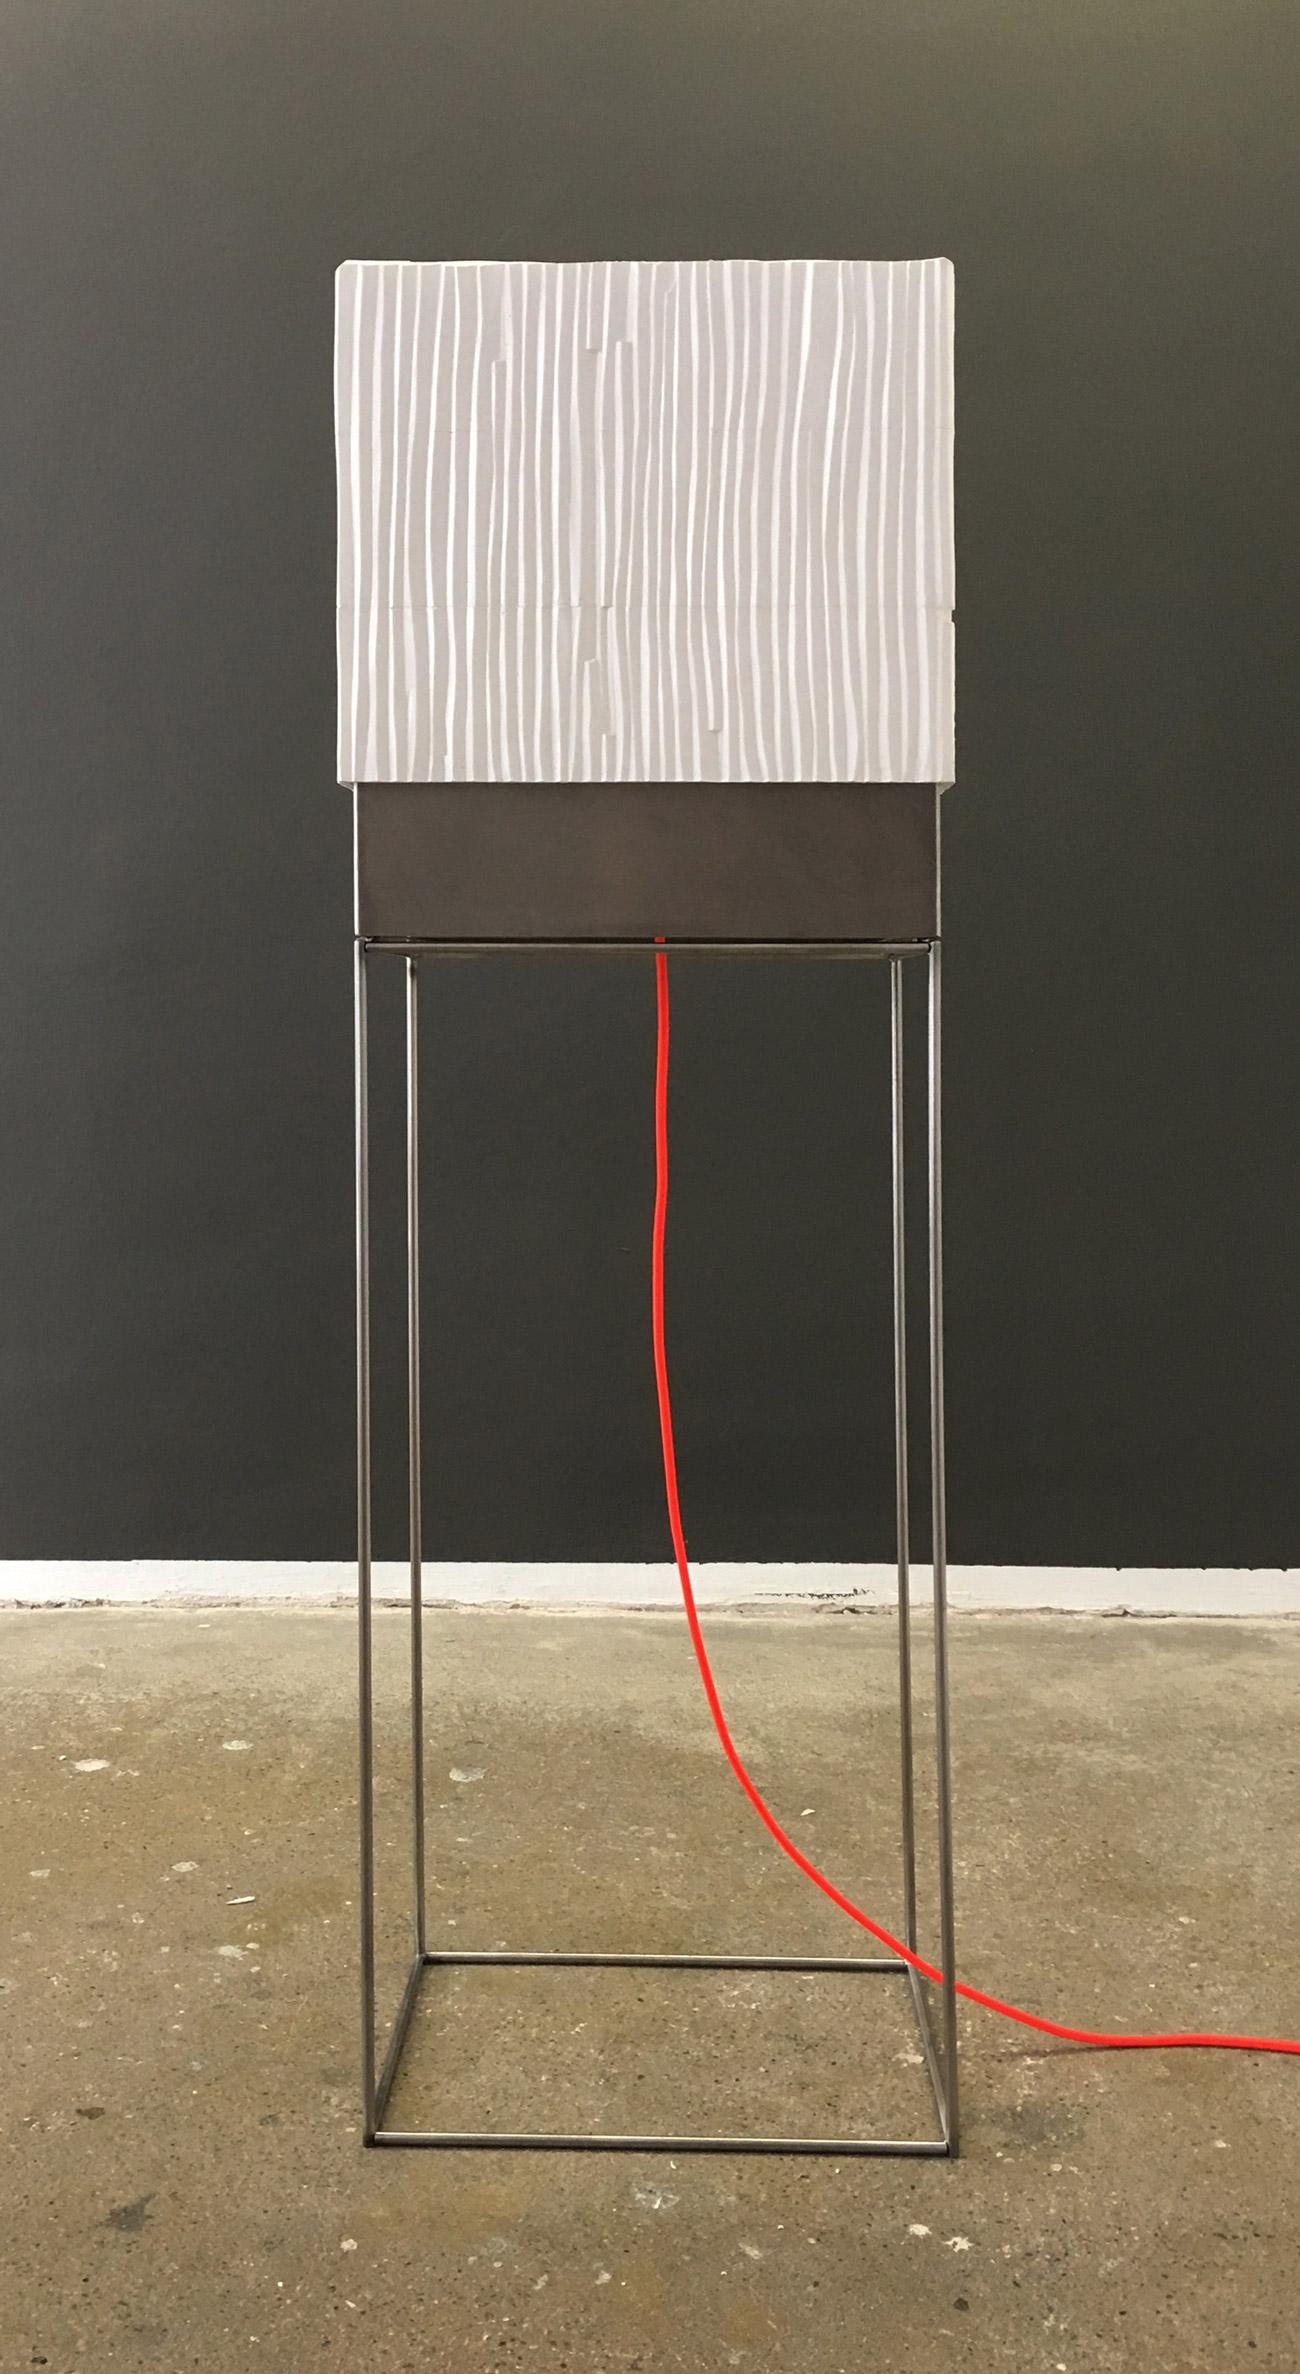 web222-floorlamp-vertical-horizontal-gislela-stiegler-marion-friedmann-gallery-frontal-view-vertical-unlit.jpg